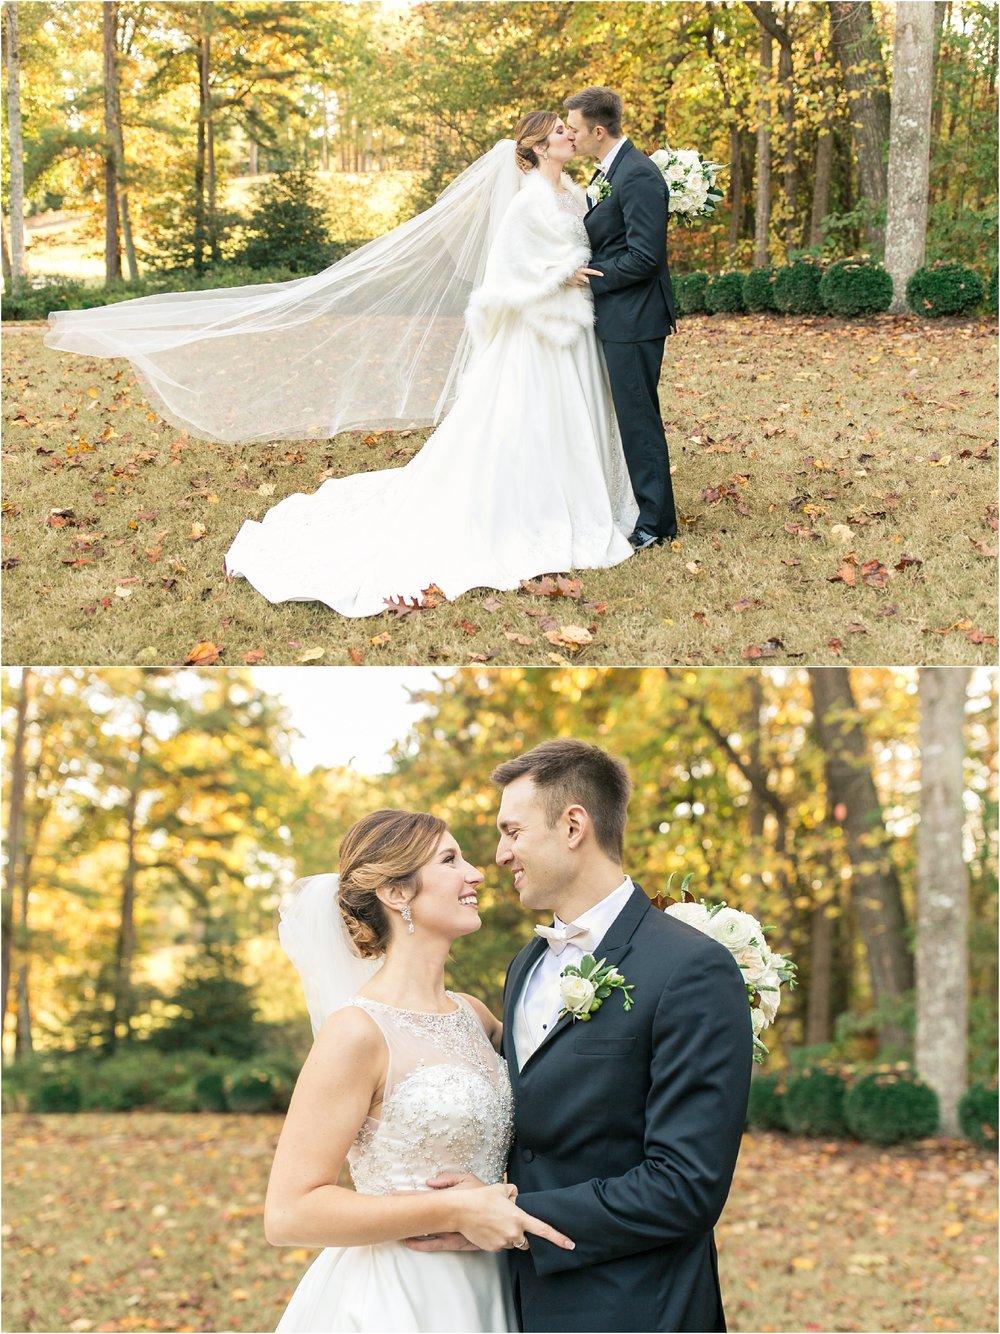 Savannah Eve Photography- Bottiglion-Scope Wedding- Sneak Peek-42.jpg